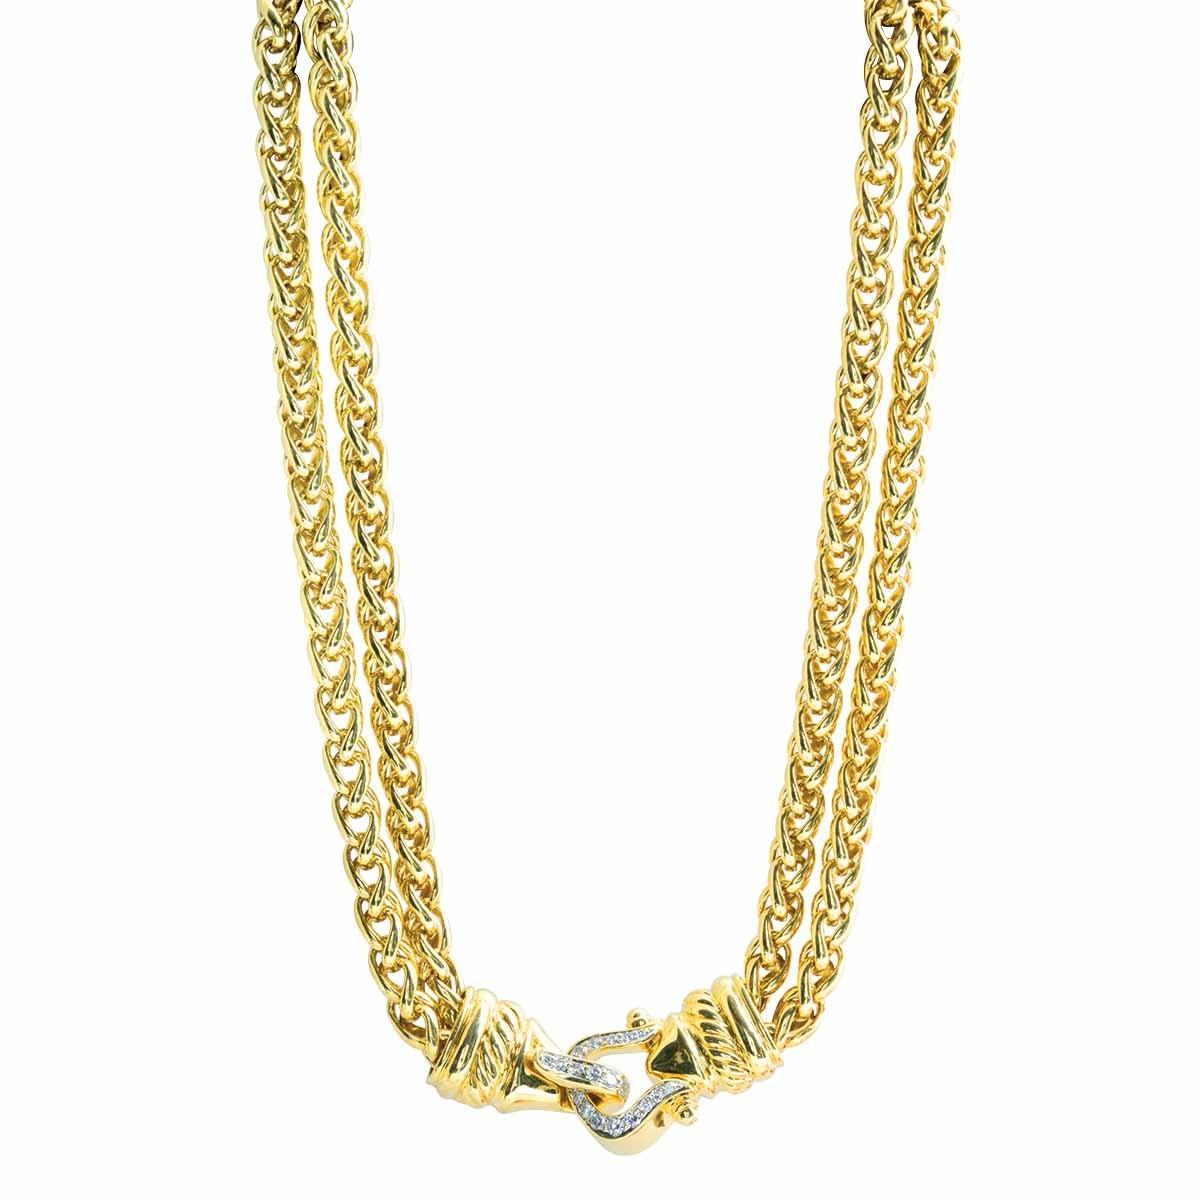 Vintage David Yurman 0.67 CTW Diamond Buckle Necklace